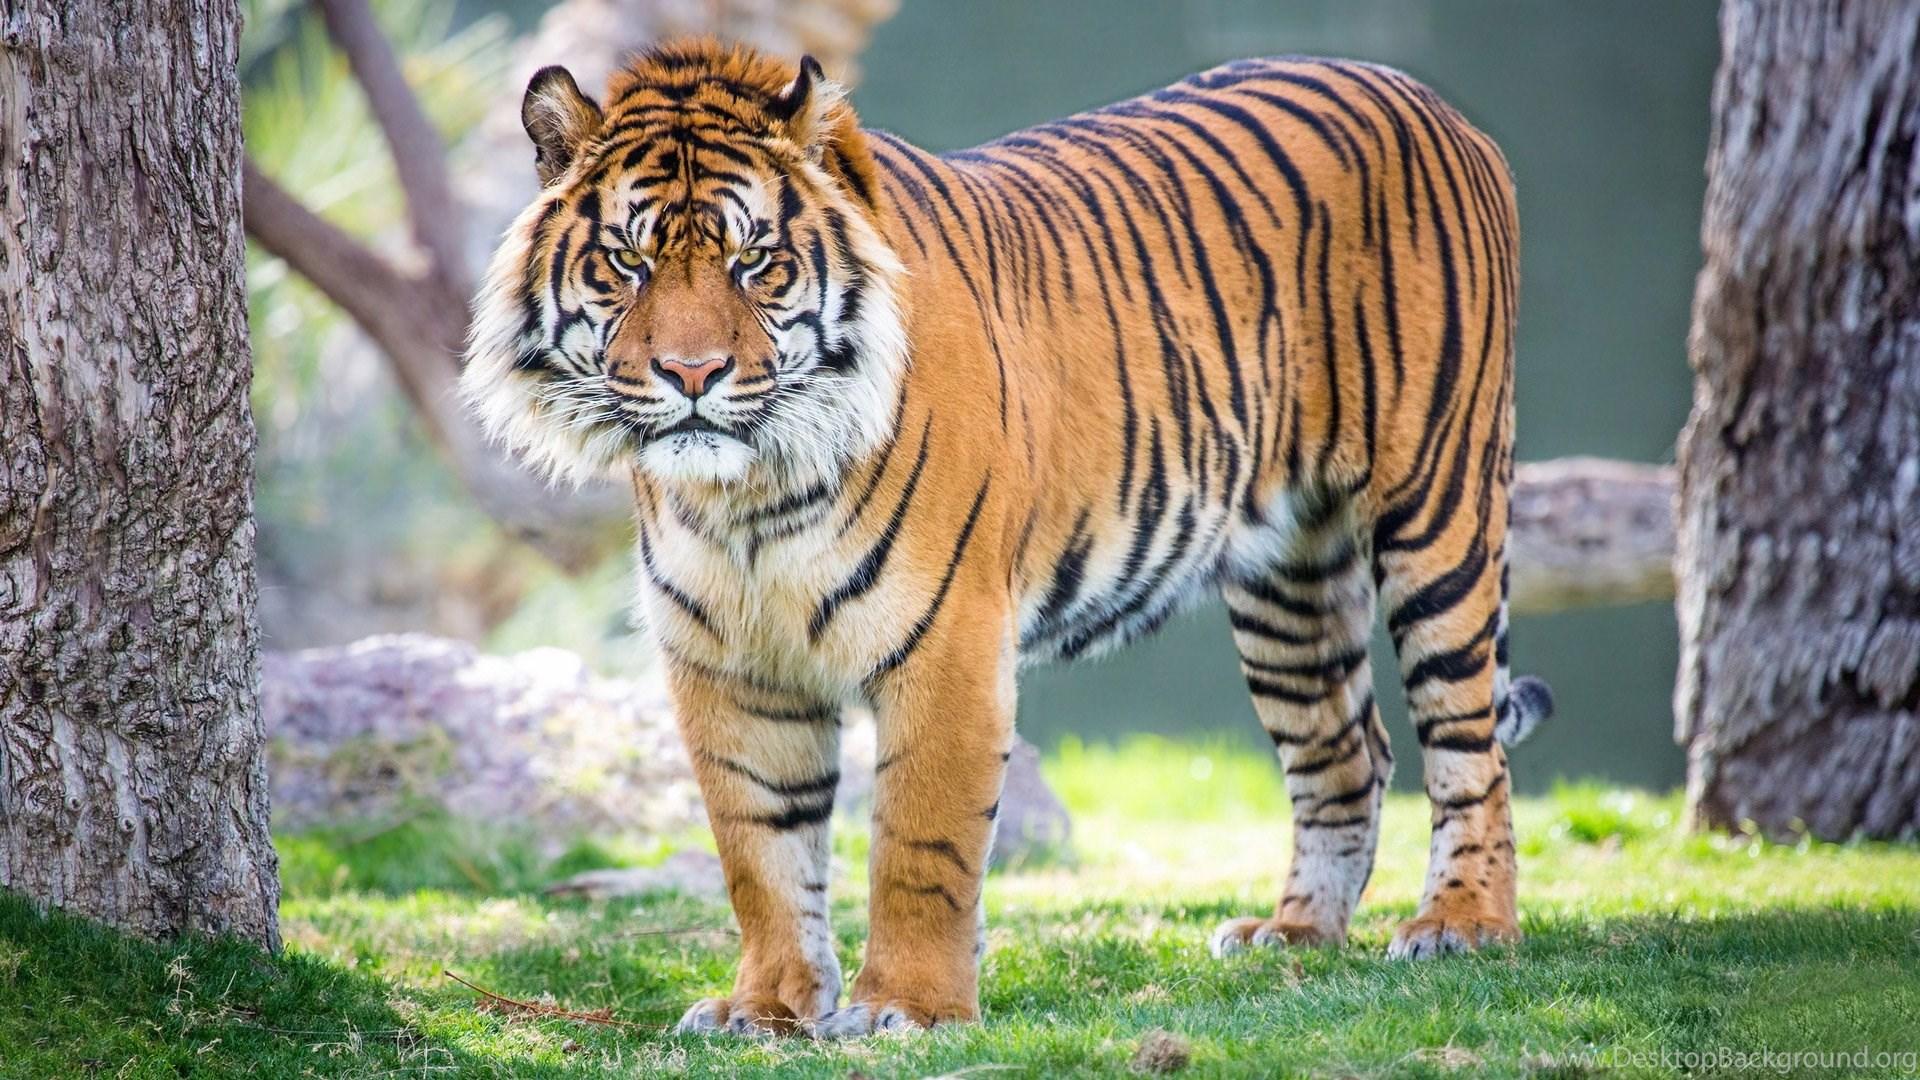 tiger free download hd wallpapers desktop background